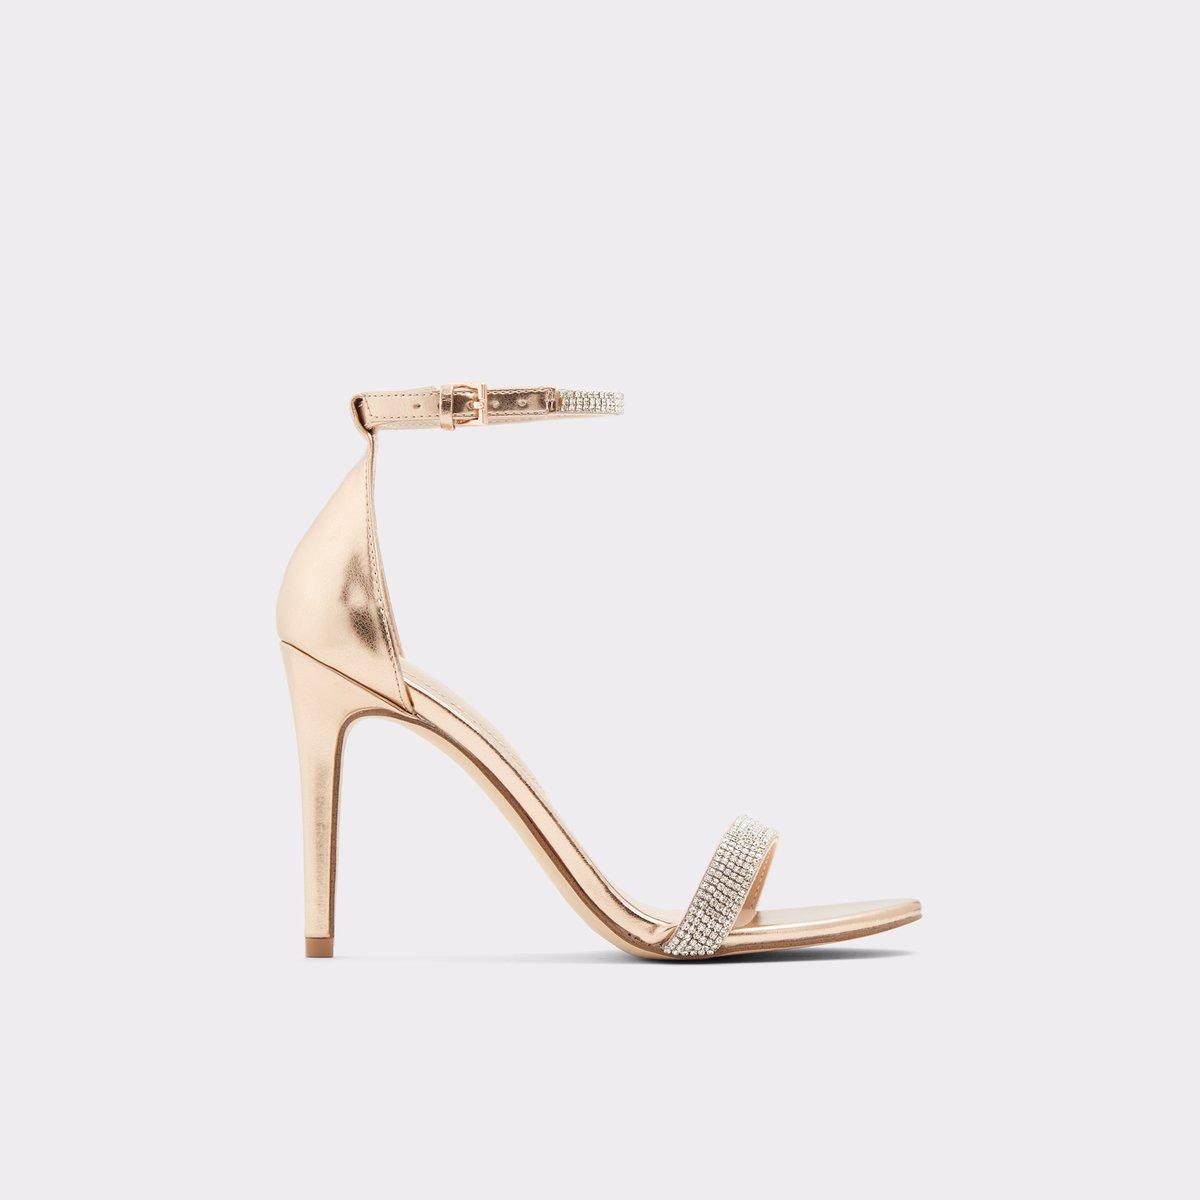 6db1ed49724 Aroclya Metallic Misc. Women s Heeled sandals